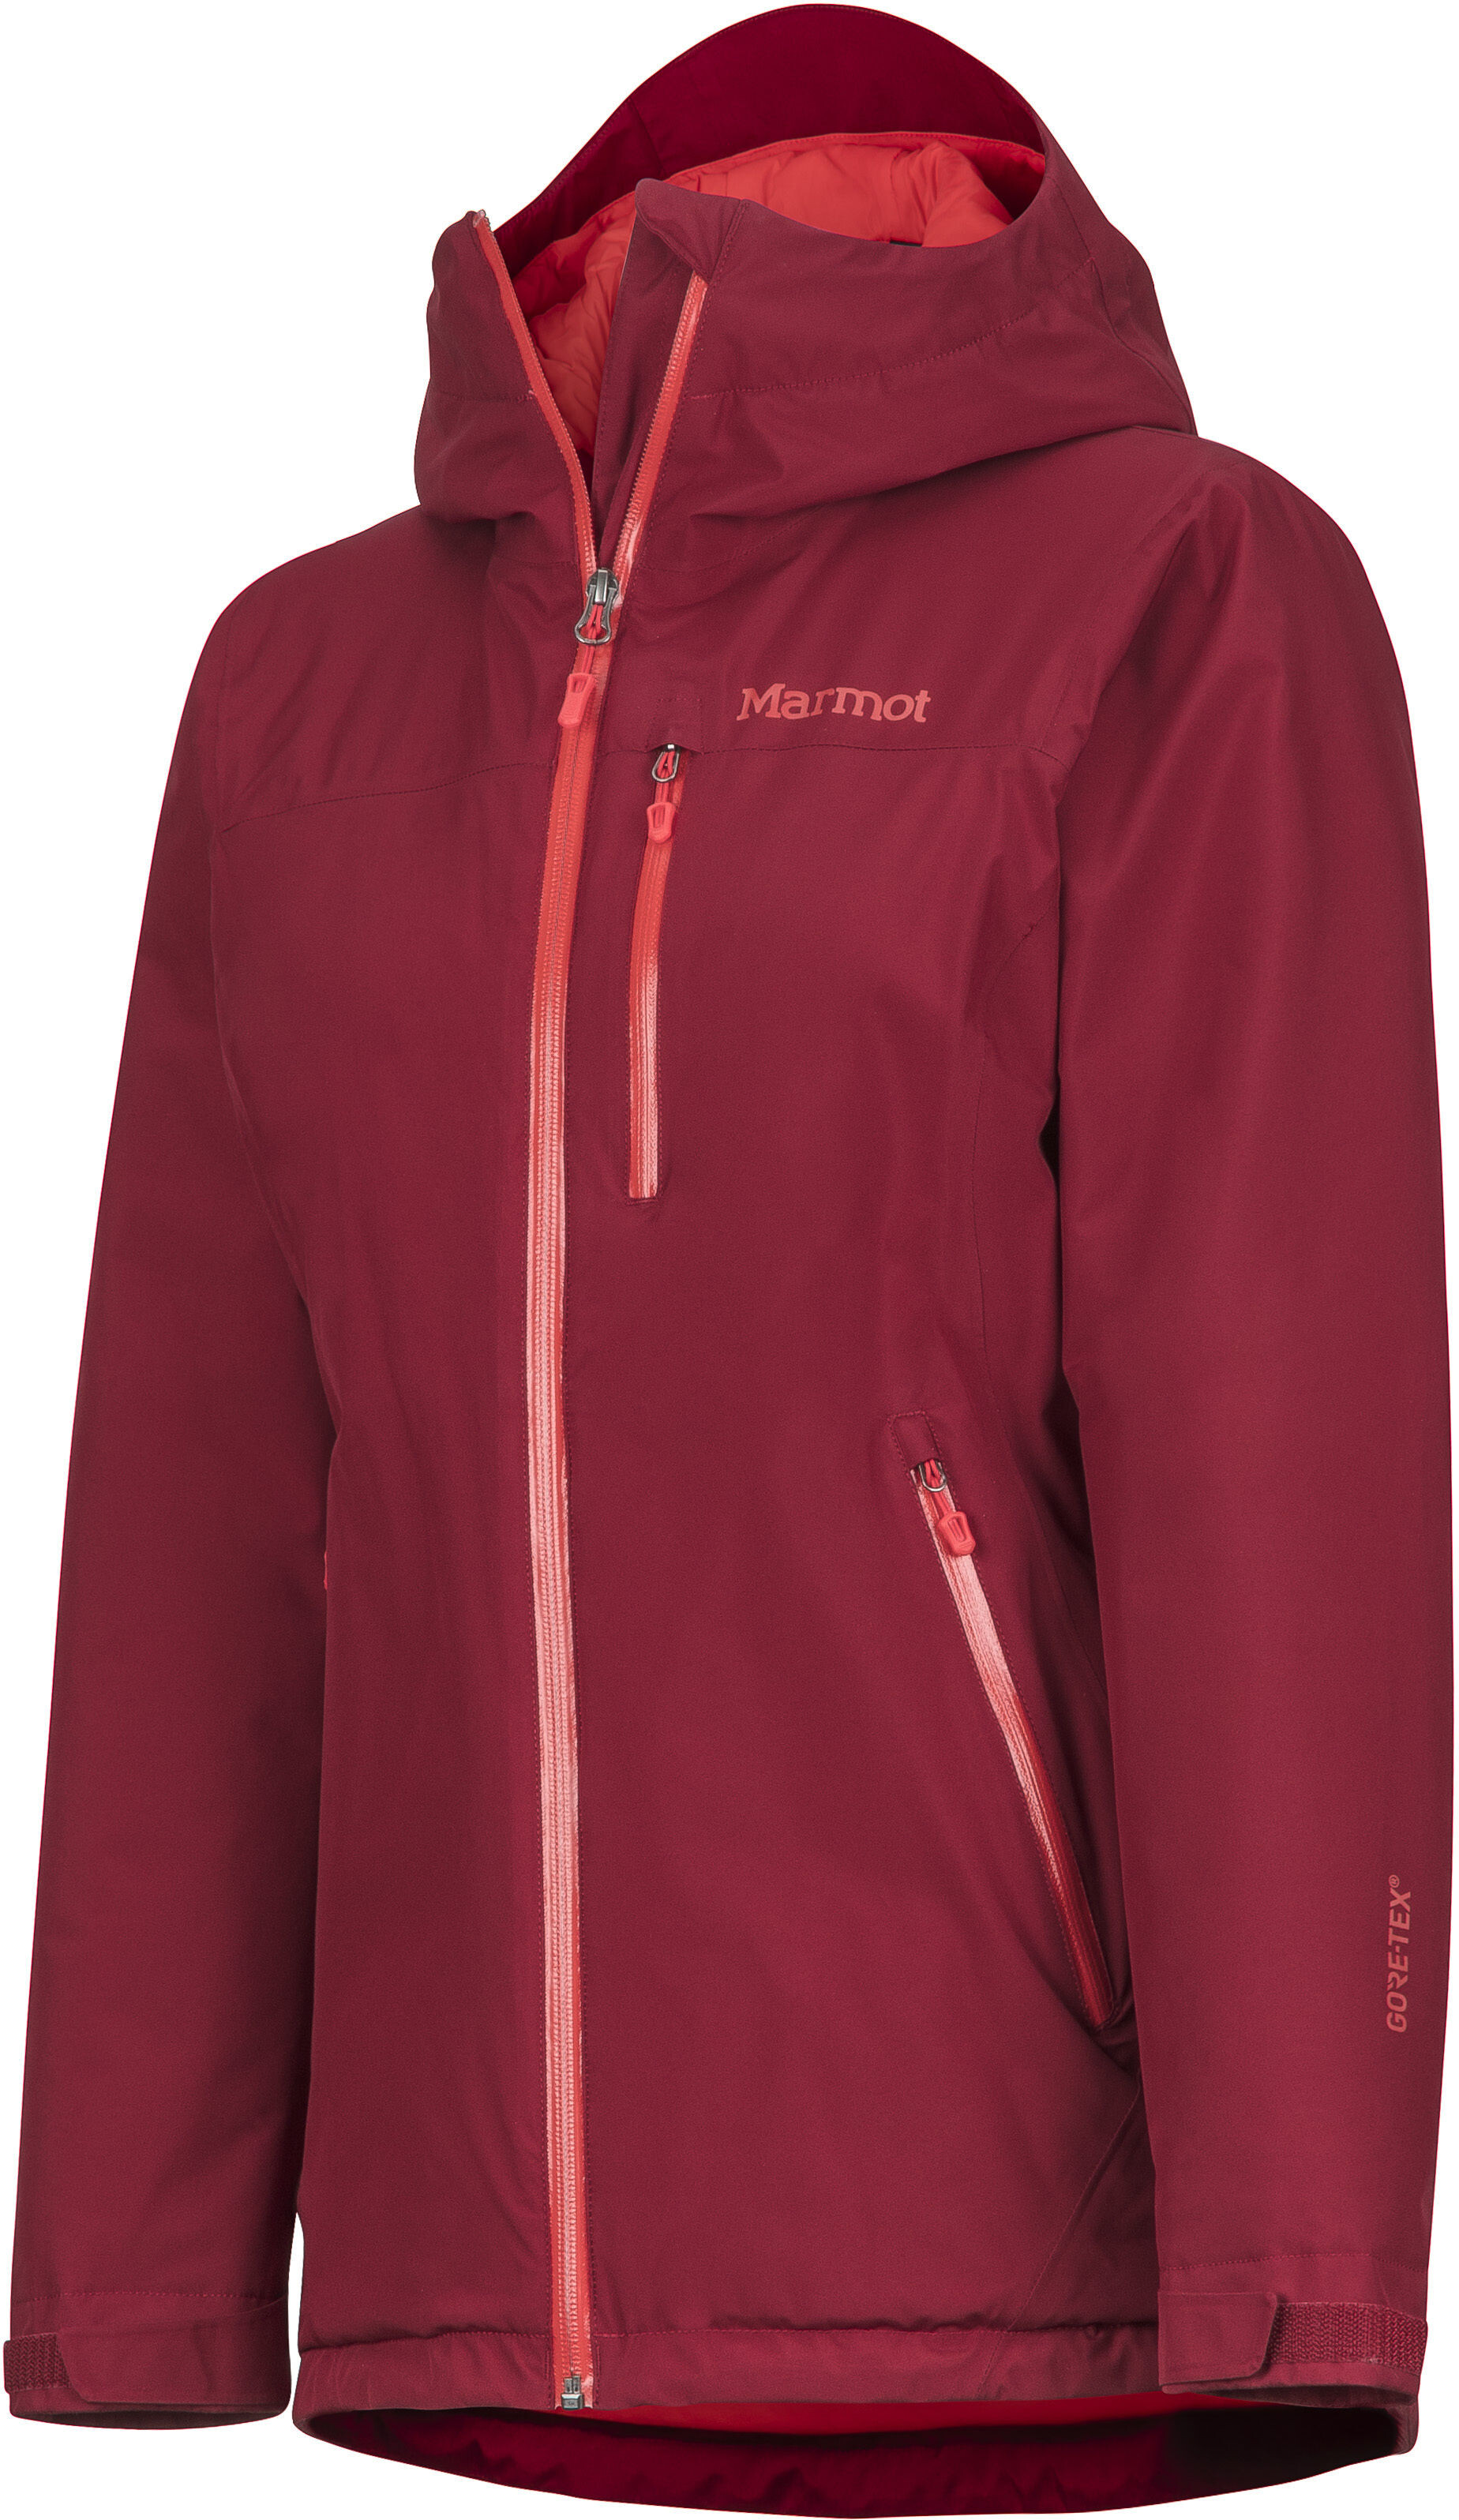 Marmot Women S Alexie Jacket: Marmot Solaris Jacket Women Red At Addnature.co.uk